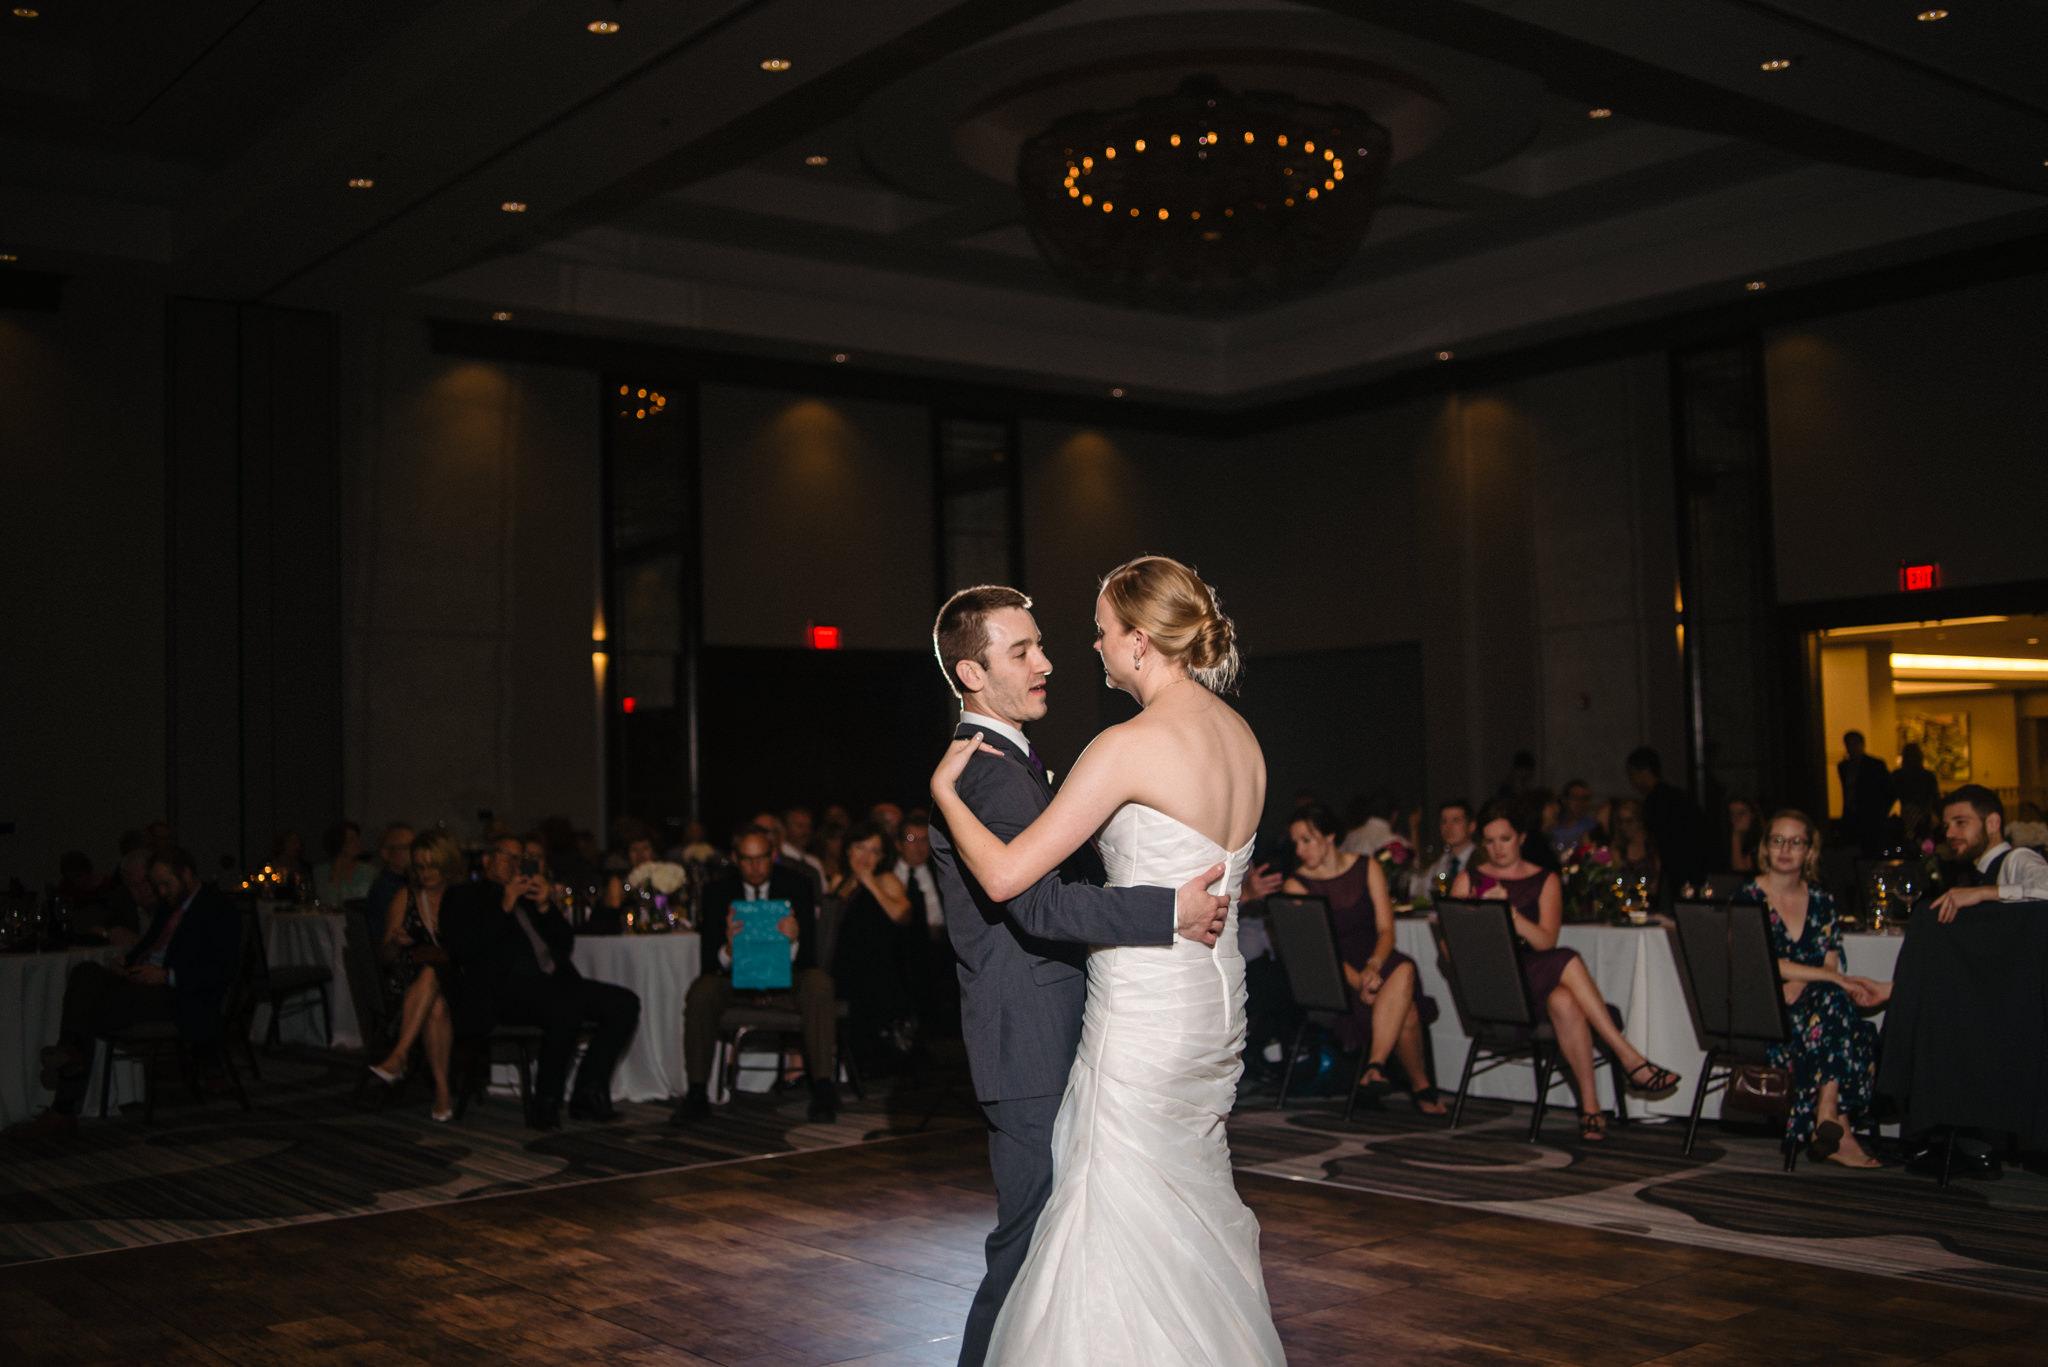 OMAHA-MARRIOTT-WEDDING-DOWNTOWN-MARRIOTT-OMAHA-WEDDING-PHOTOGRAPHER-JM-STUDIOS-041.jpg